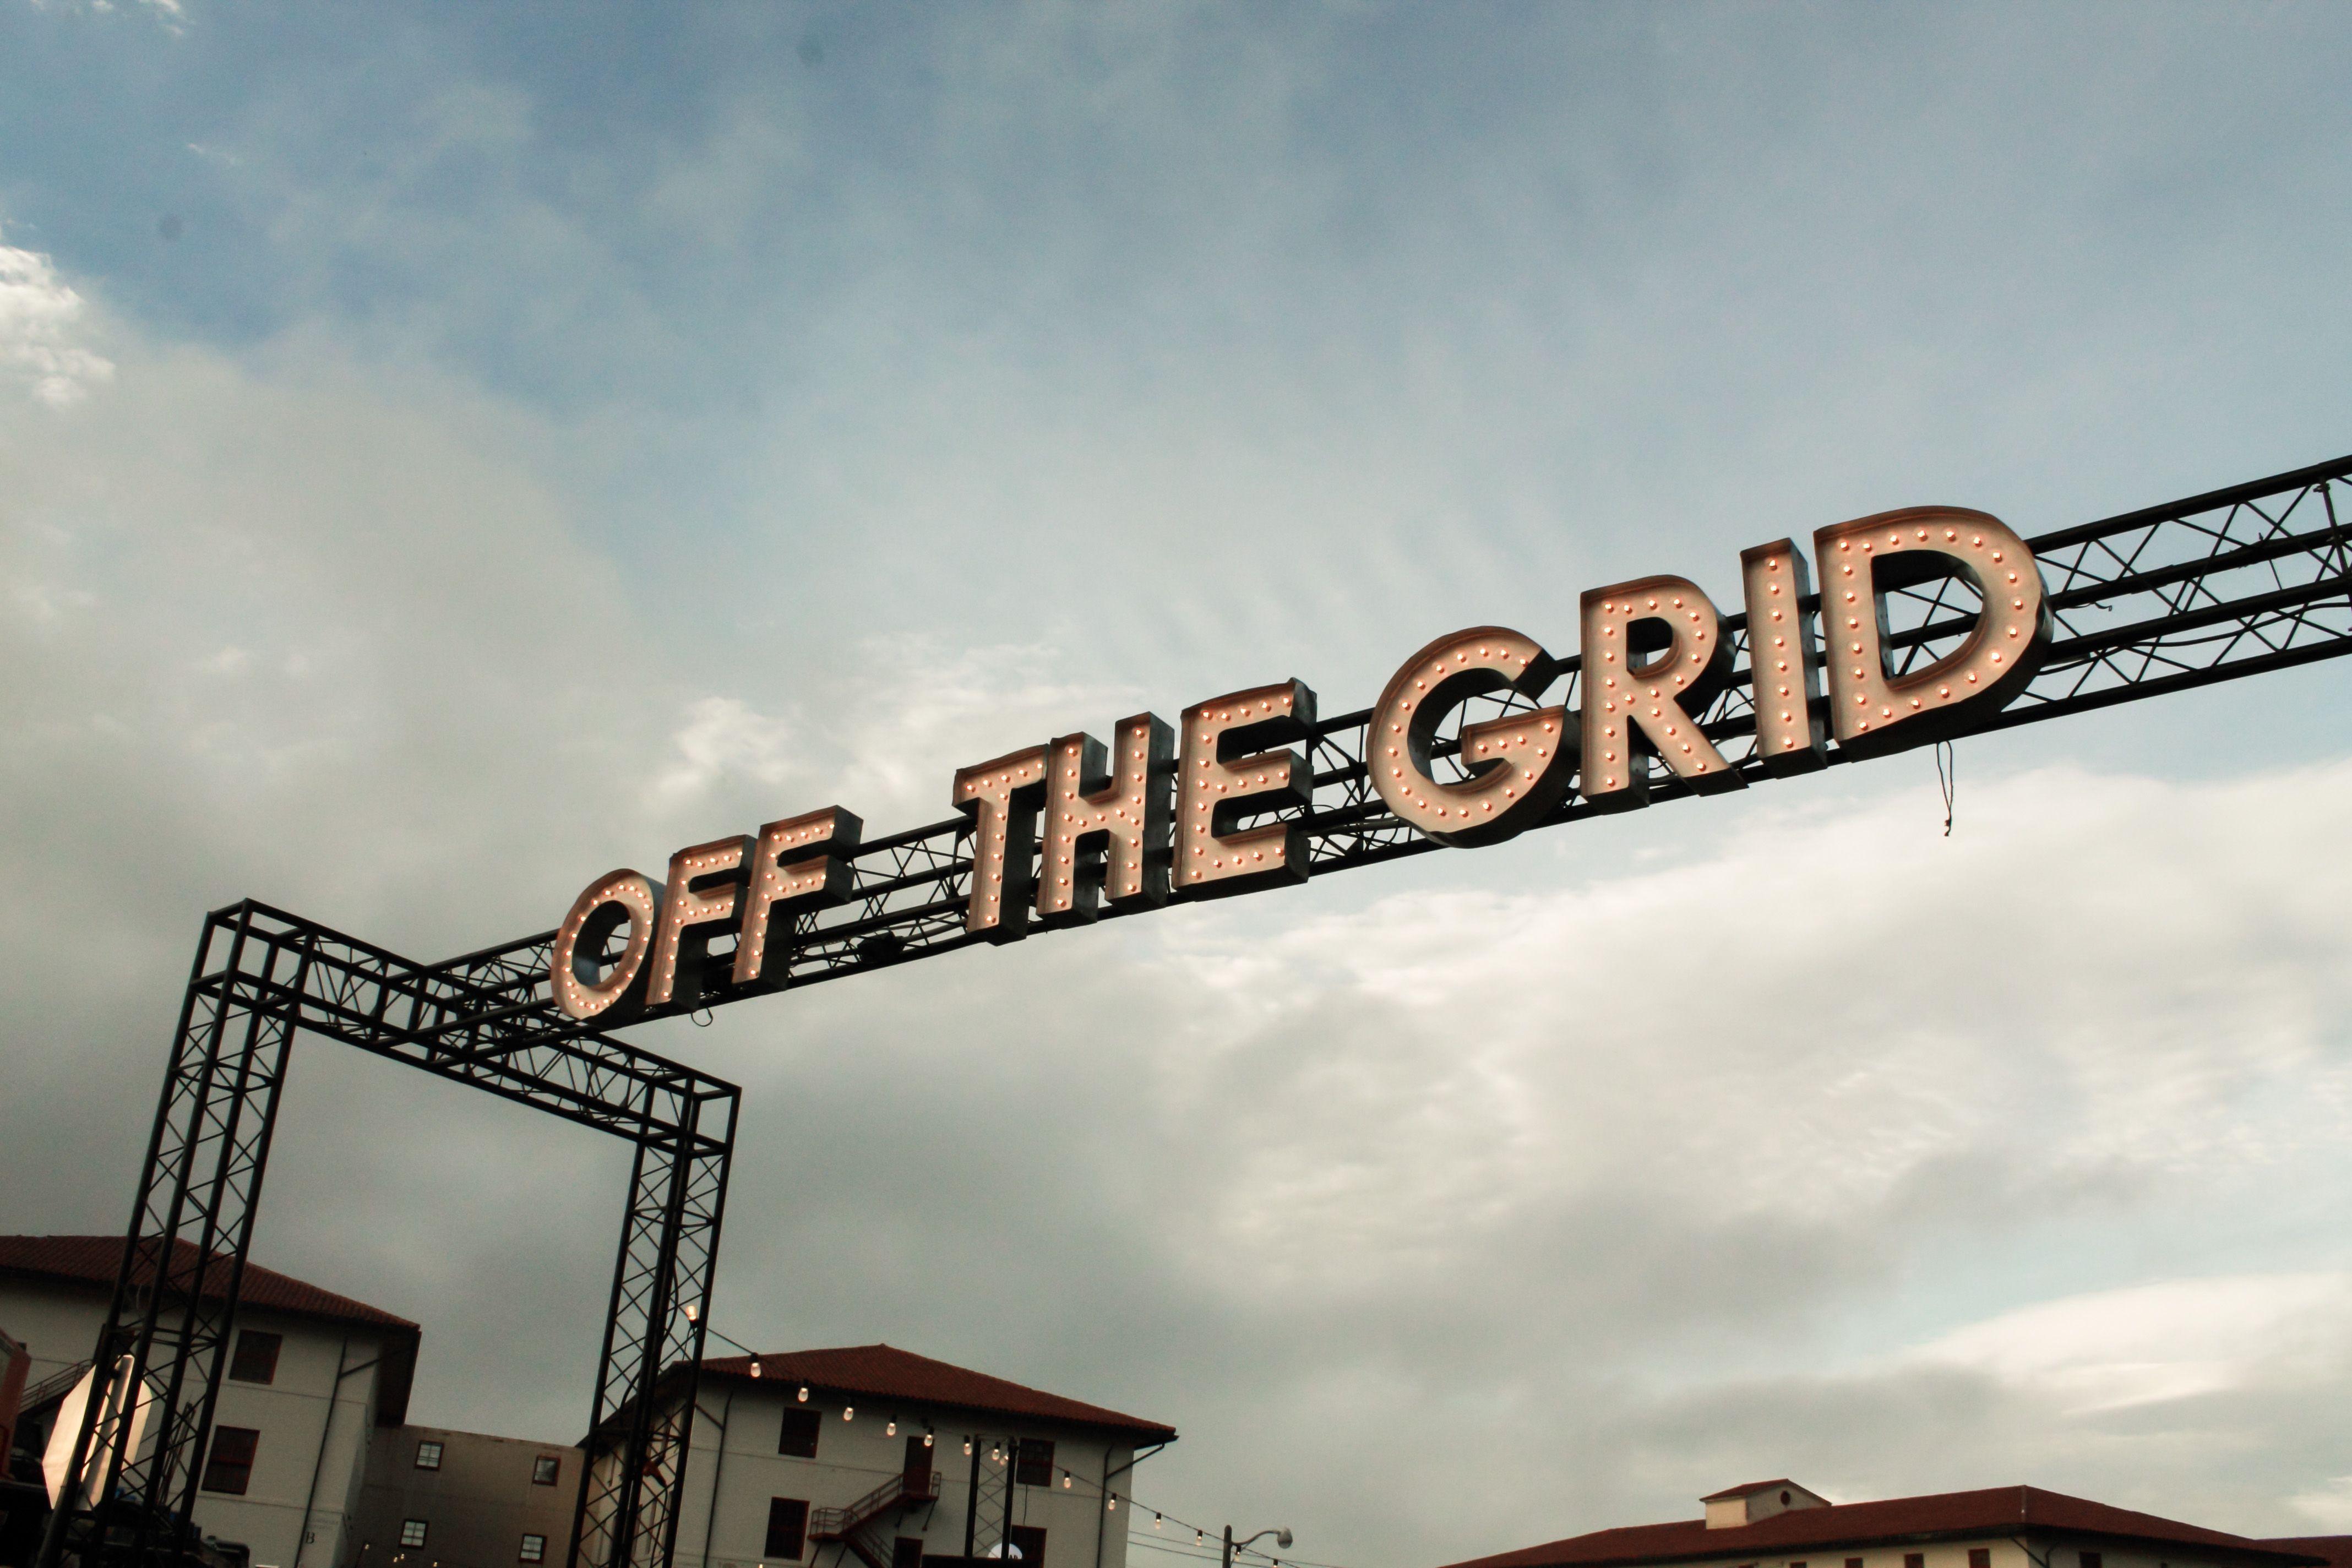 Entry sign for Off The Grid, Fort Mason, Marina neighborhood, San Francisco